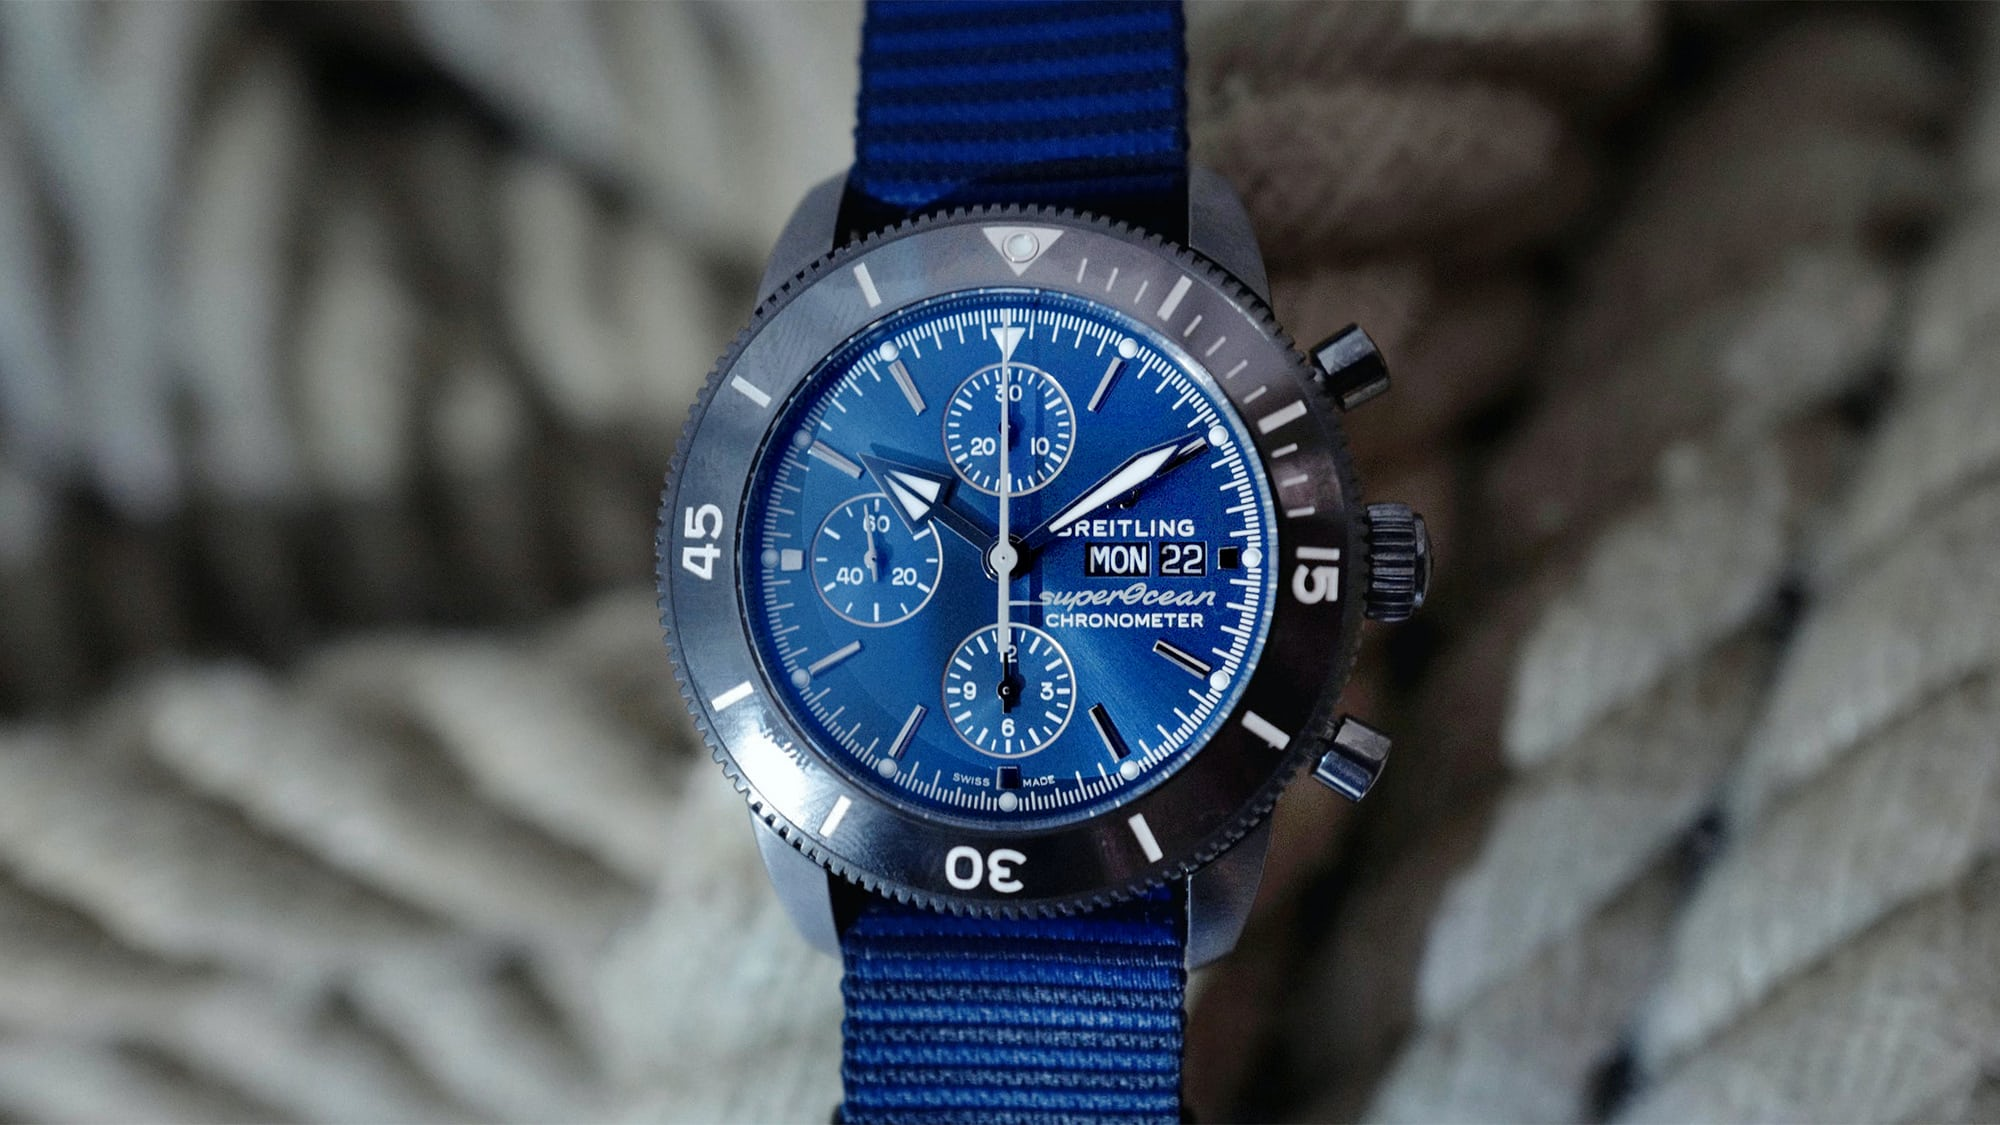 Introducing: The Breitling Superocean Héritage II Chronograph 44 Outerknown breitling superocean